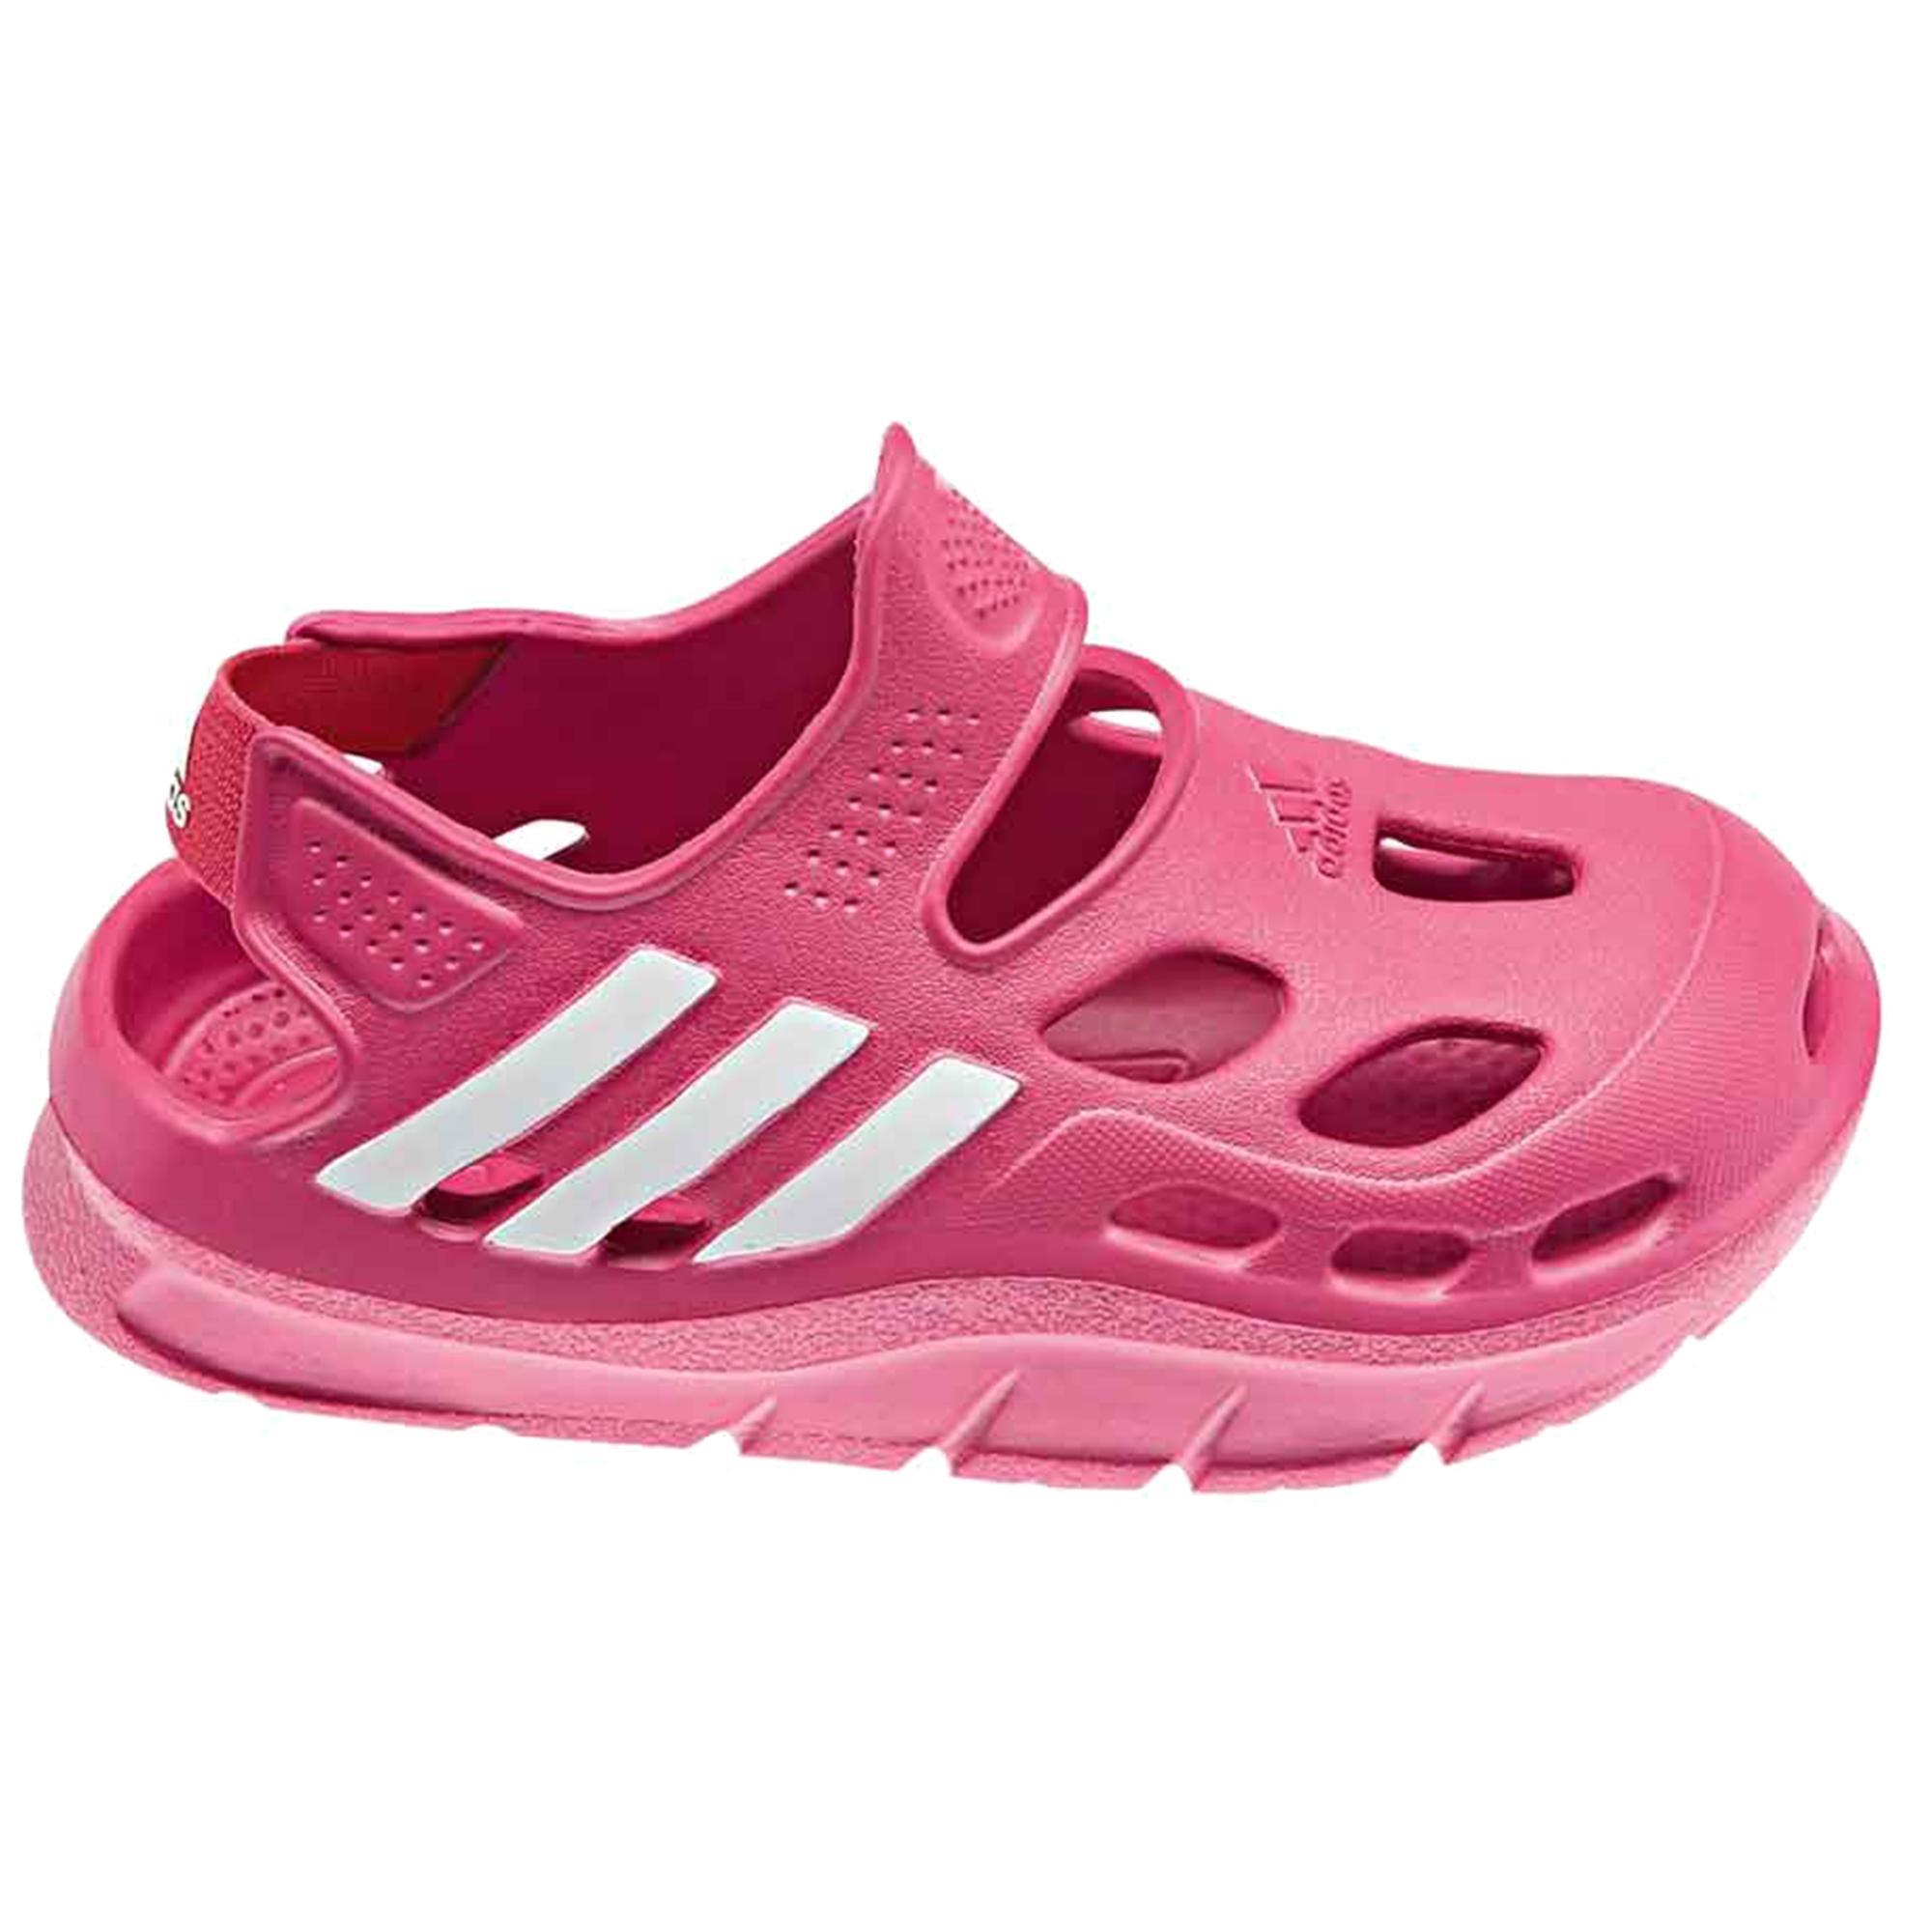 4ff0737a4255 adidas Varisol Closed Toe Sandal Çocuk Sandalet  Q22609 - Barcin.com